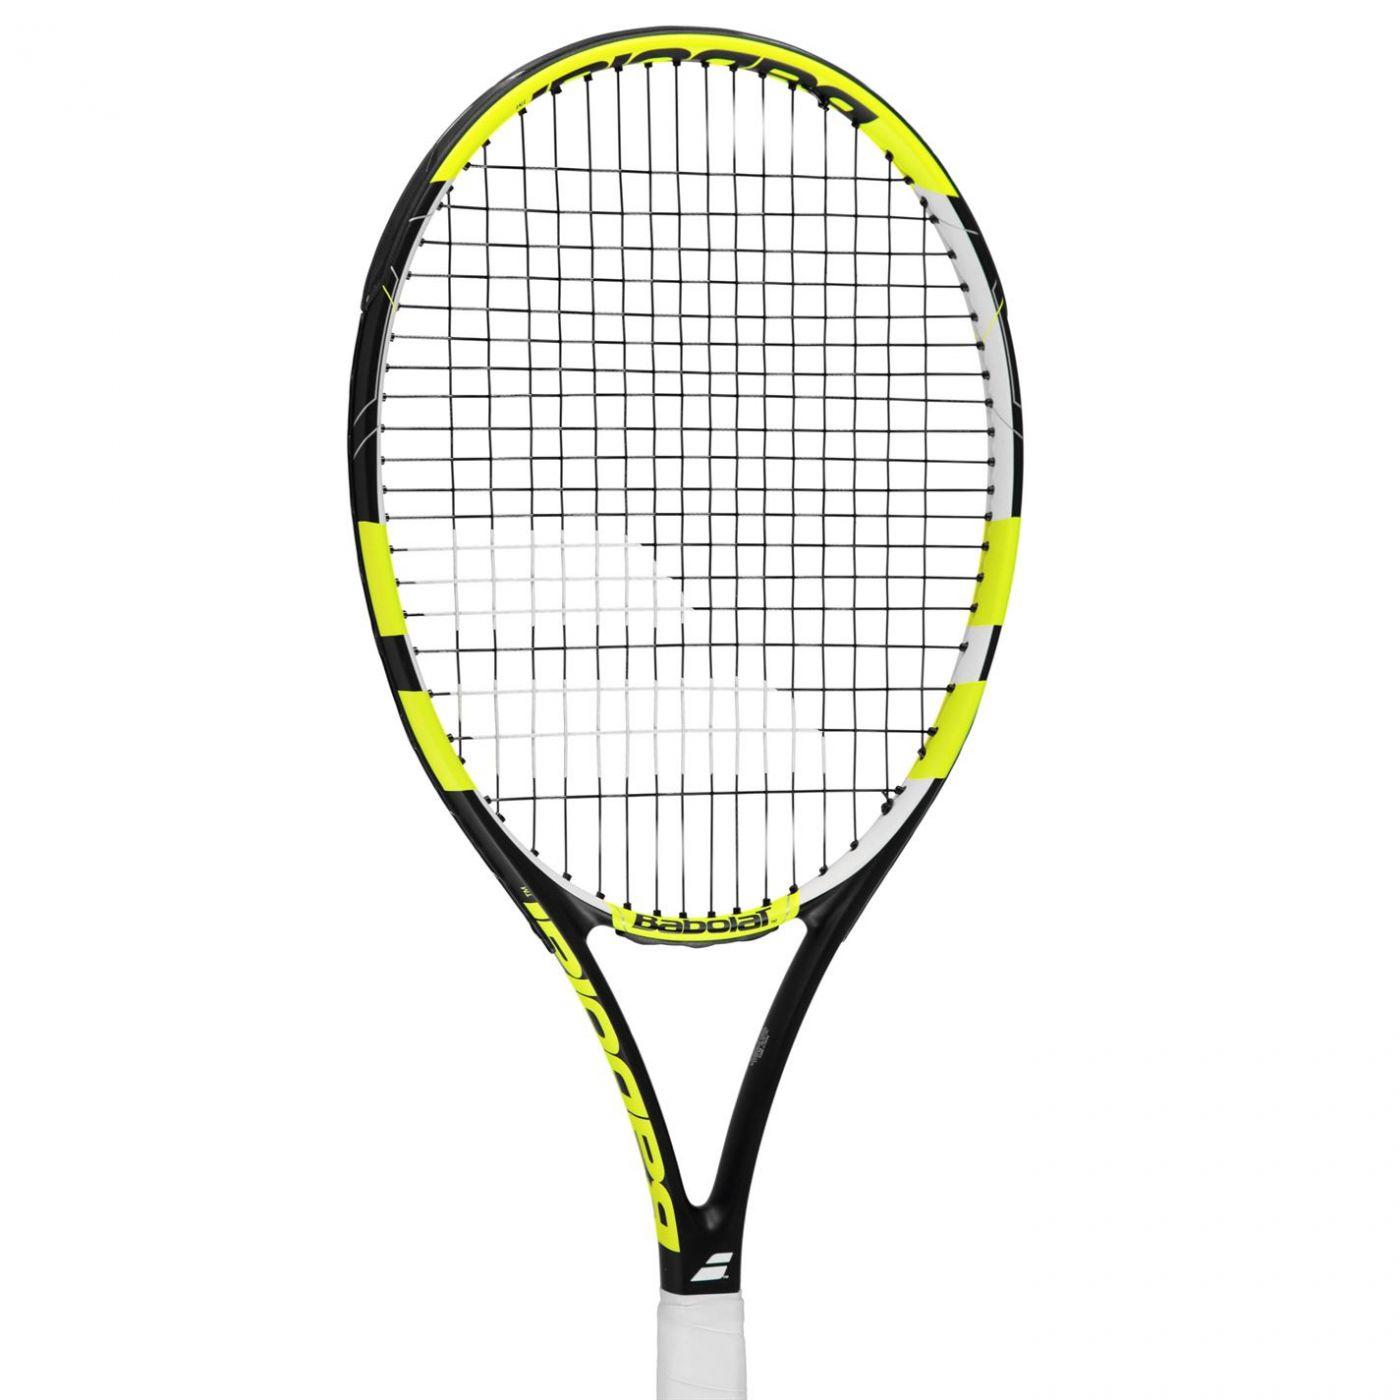 Babolat Evoke Competition Tennis Racket